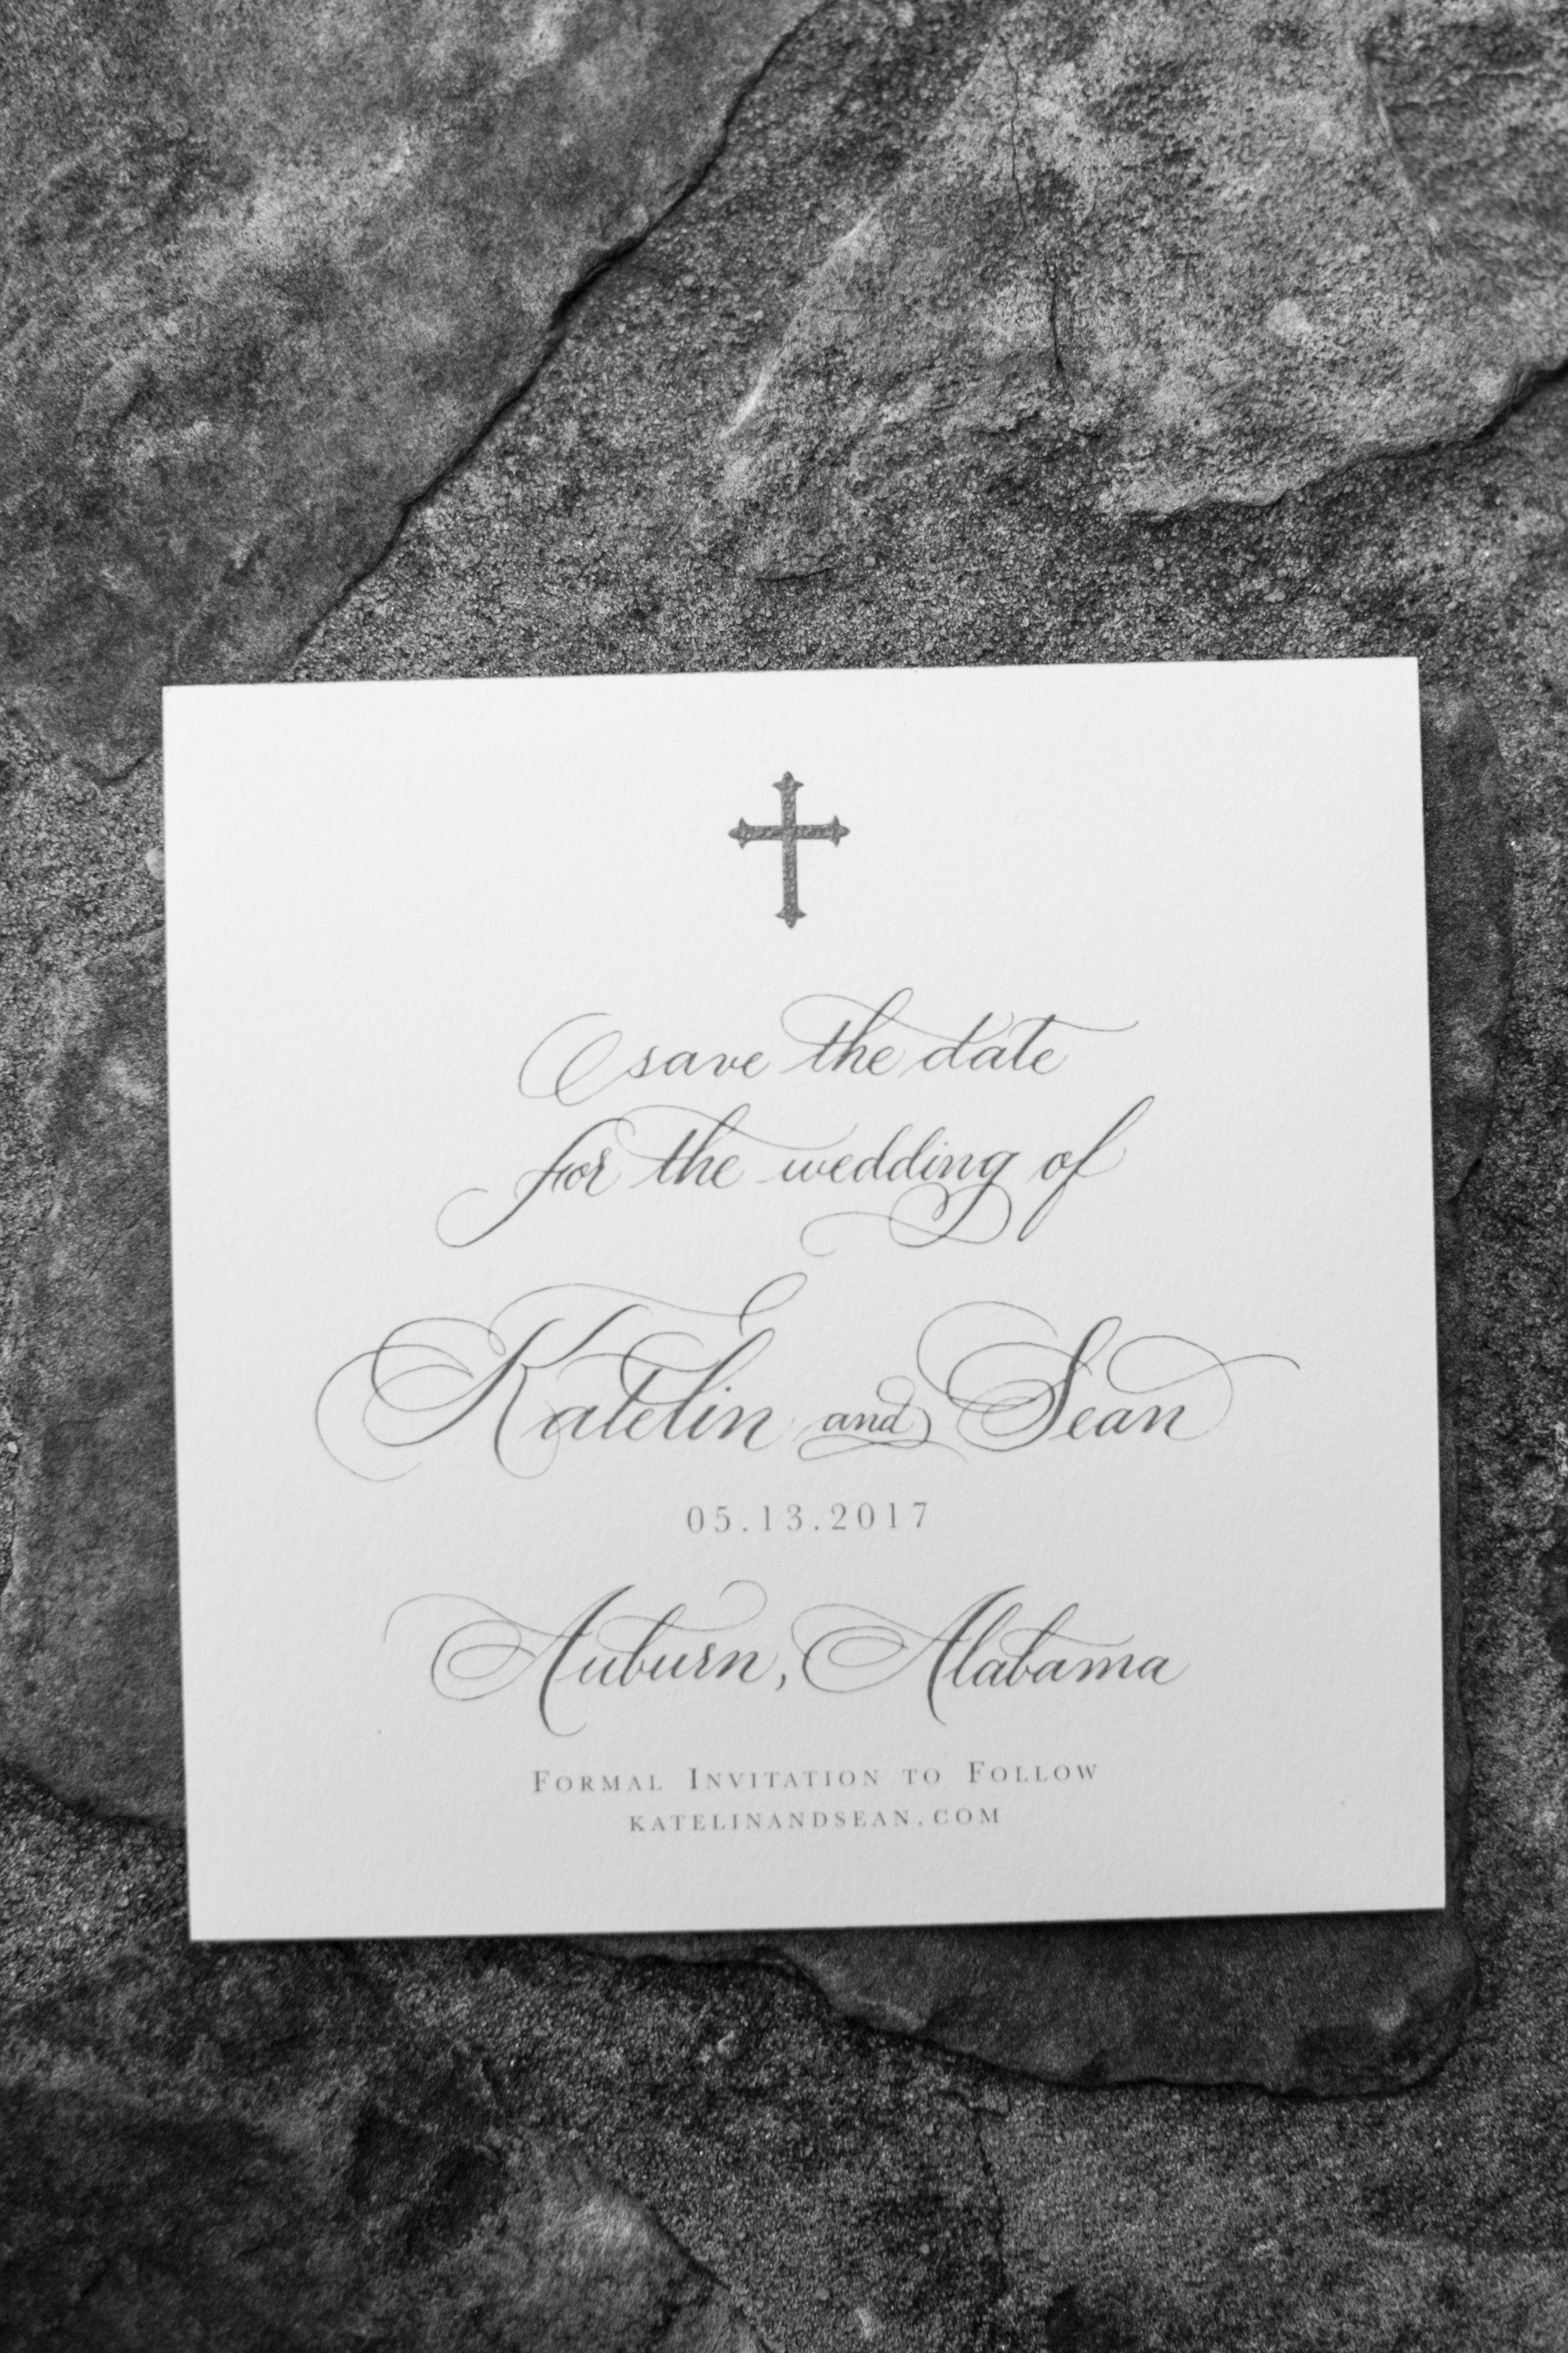 wedding invitations atlanta%0A Wedding Invitation Calligraphy by Ashlyn Writes  Atlanta Calligrapher